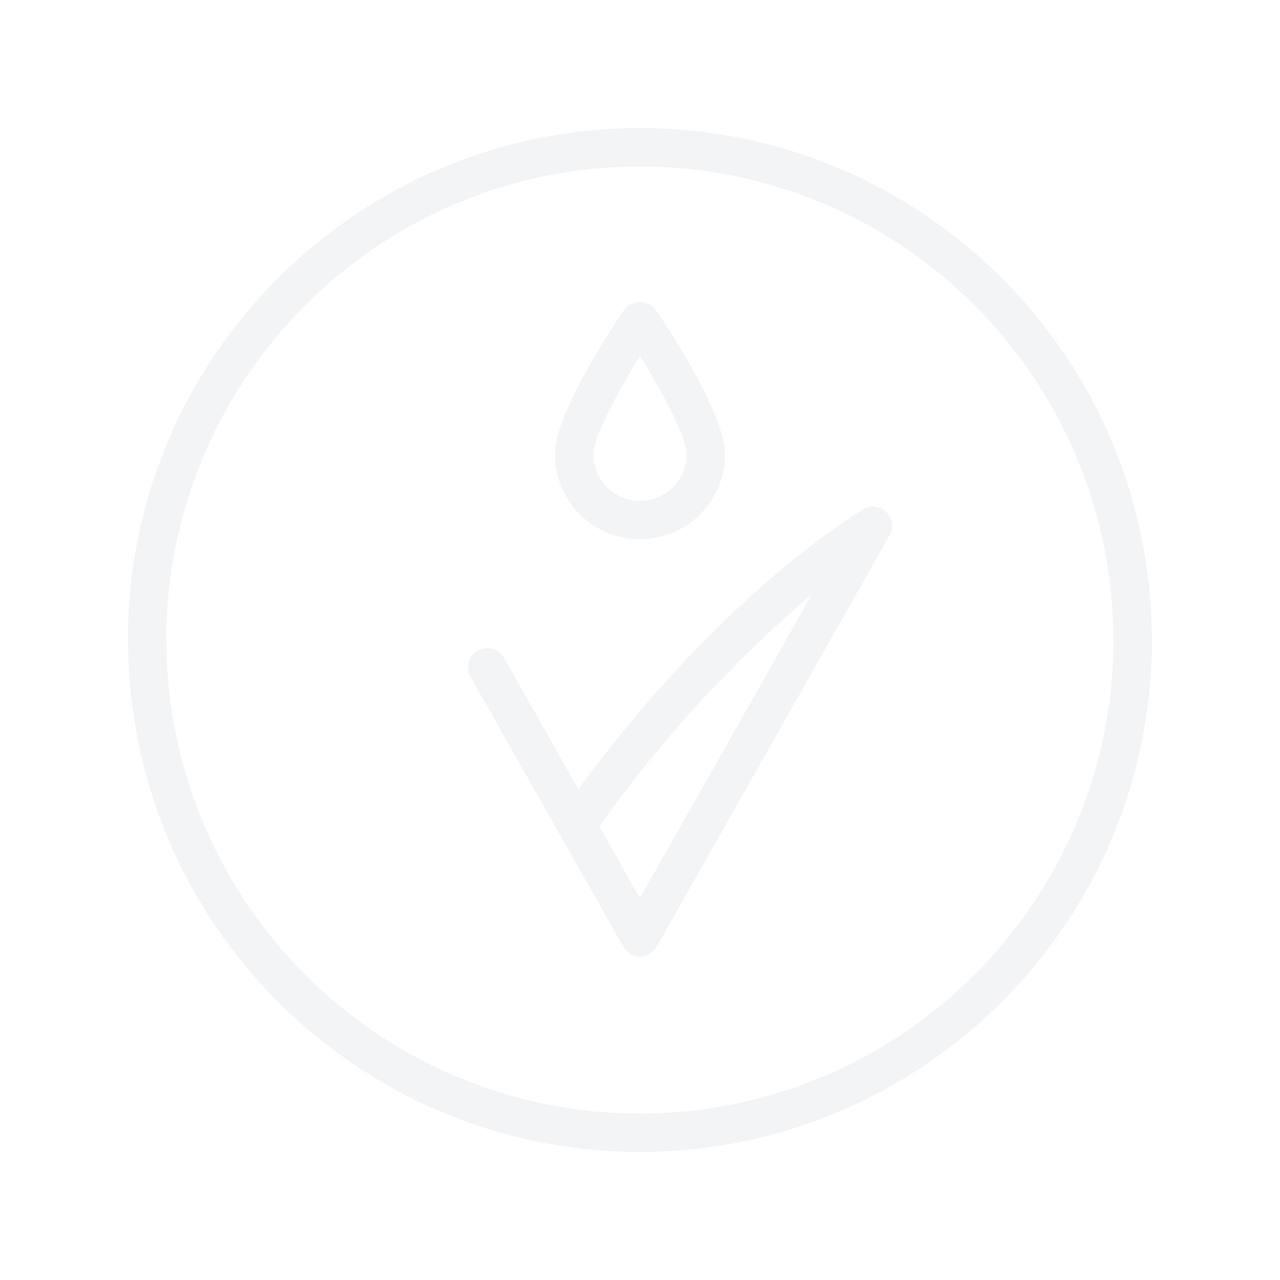 NATURA SIBERICA Sauna & Spa Foot Butter 120ml